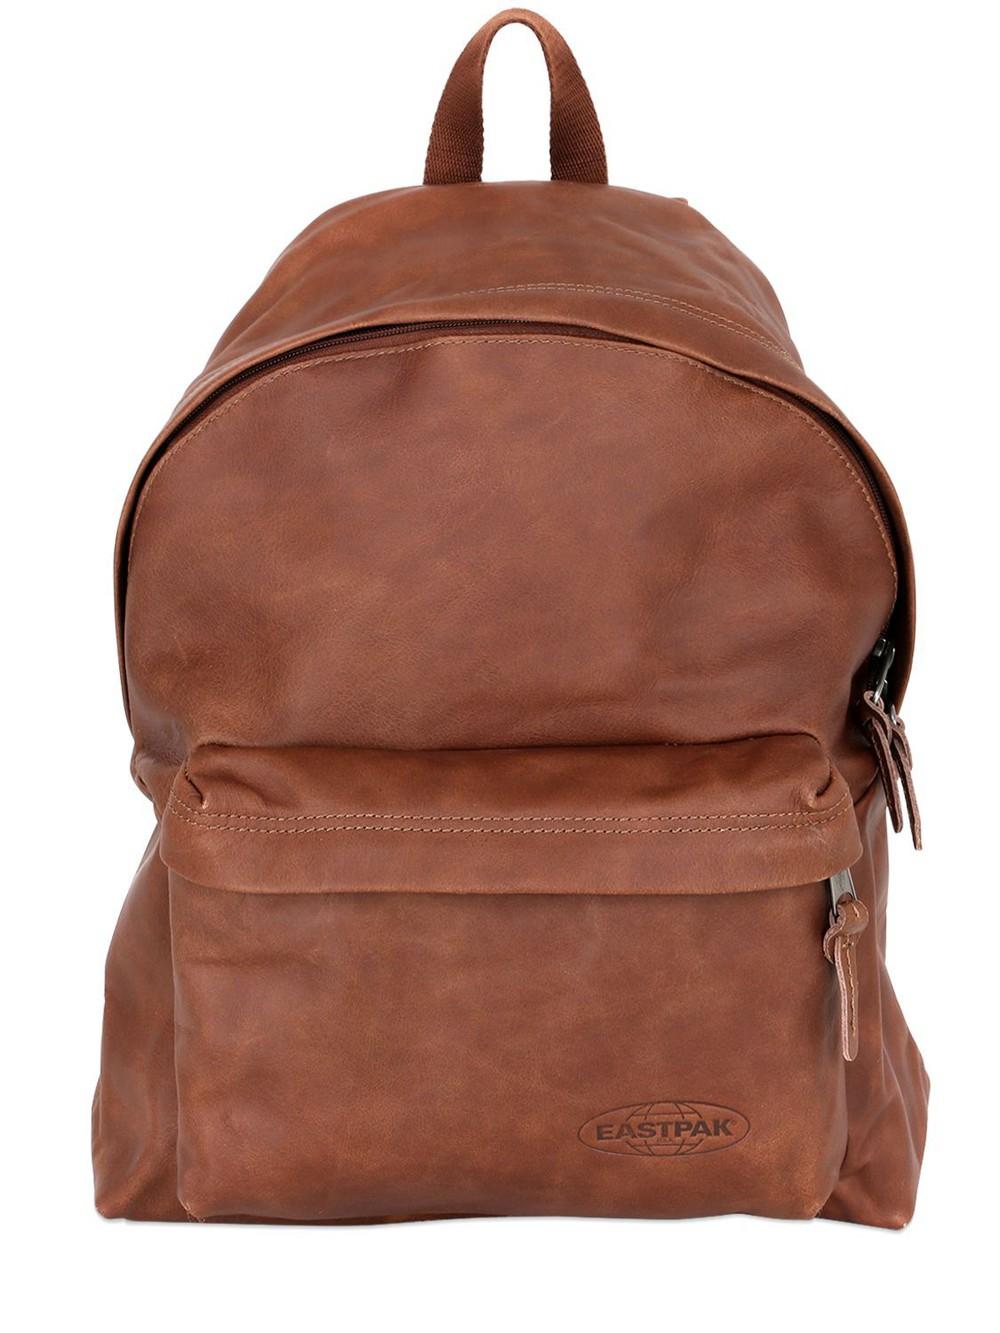 backpack, leather backpack, leather, light, brown, bag ...